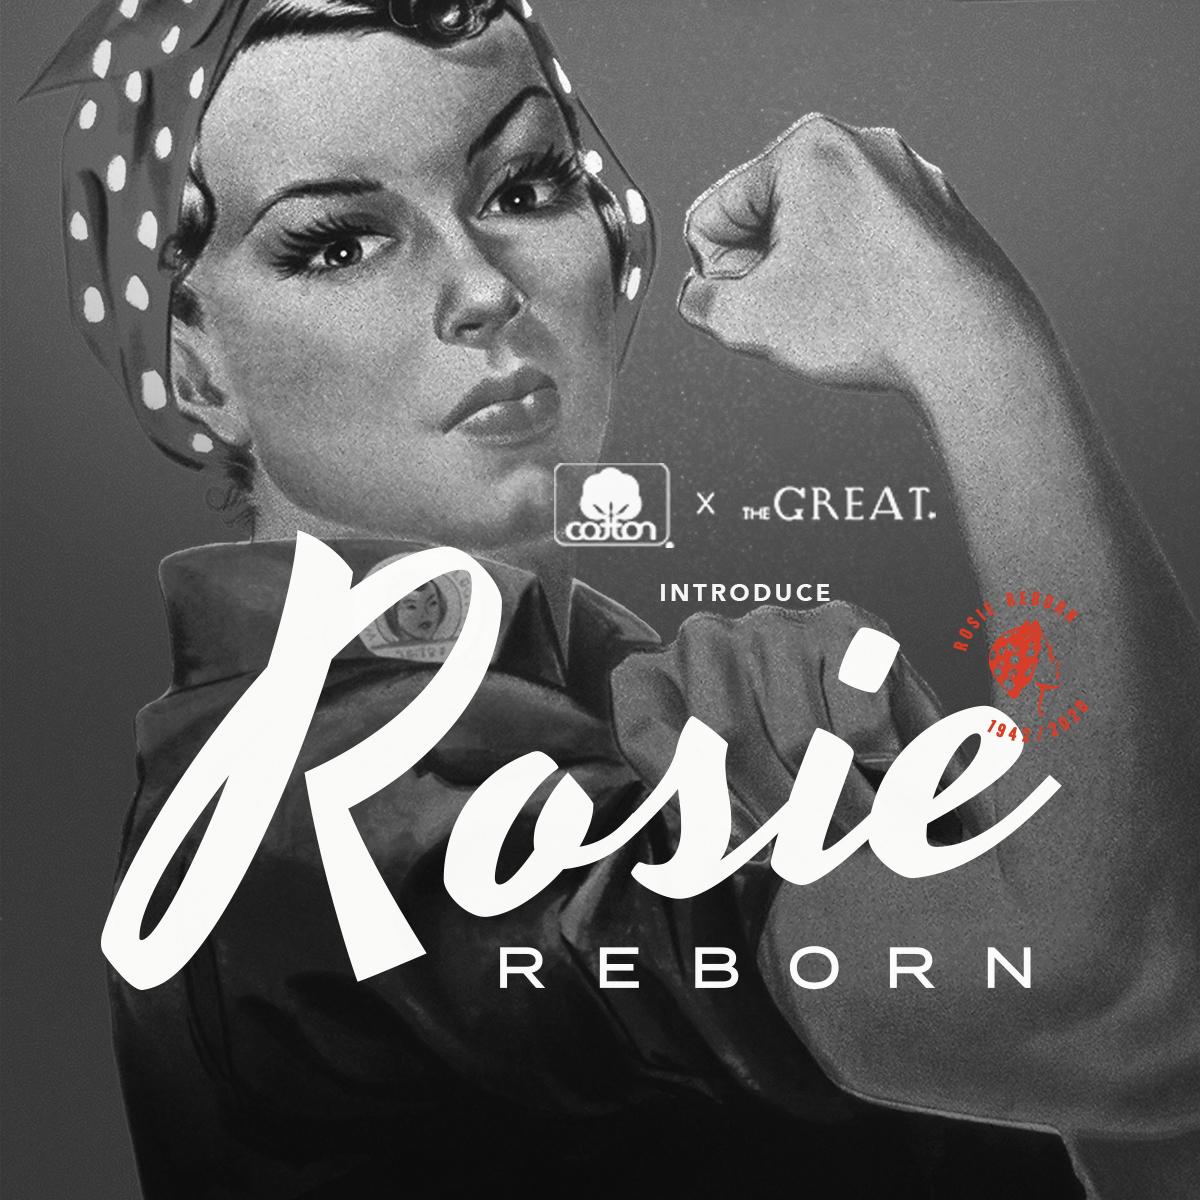 rosie the riveter reborn